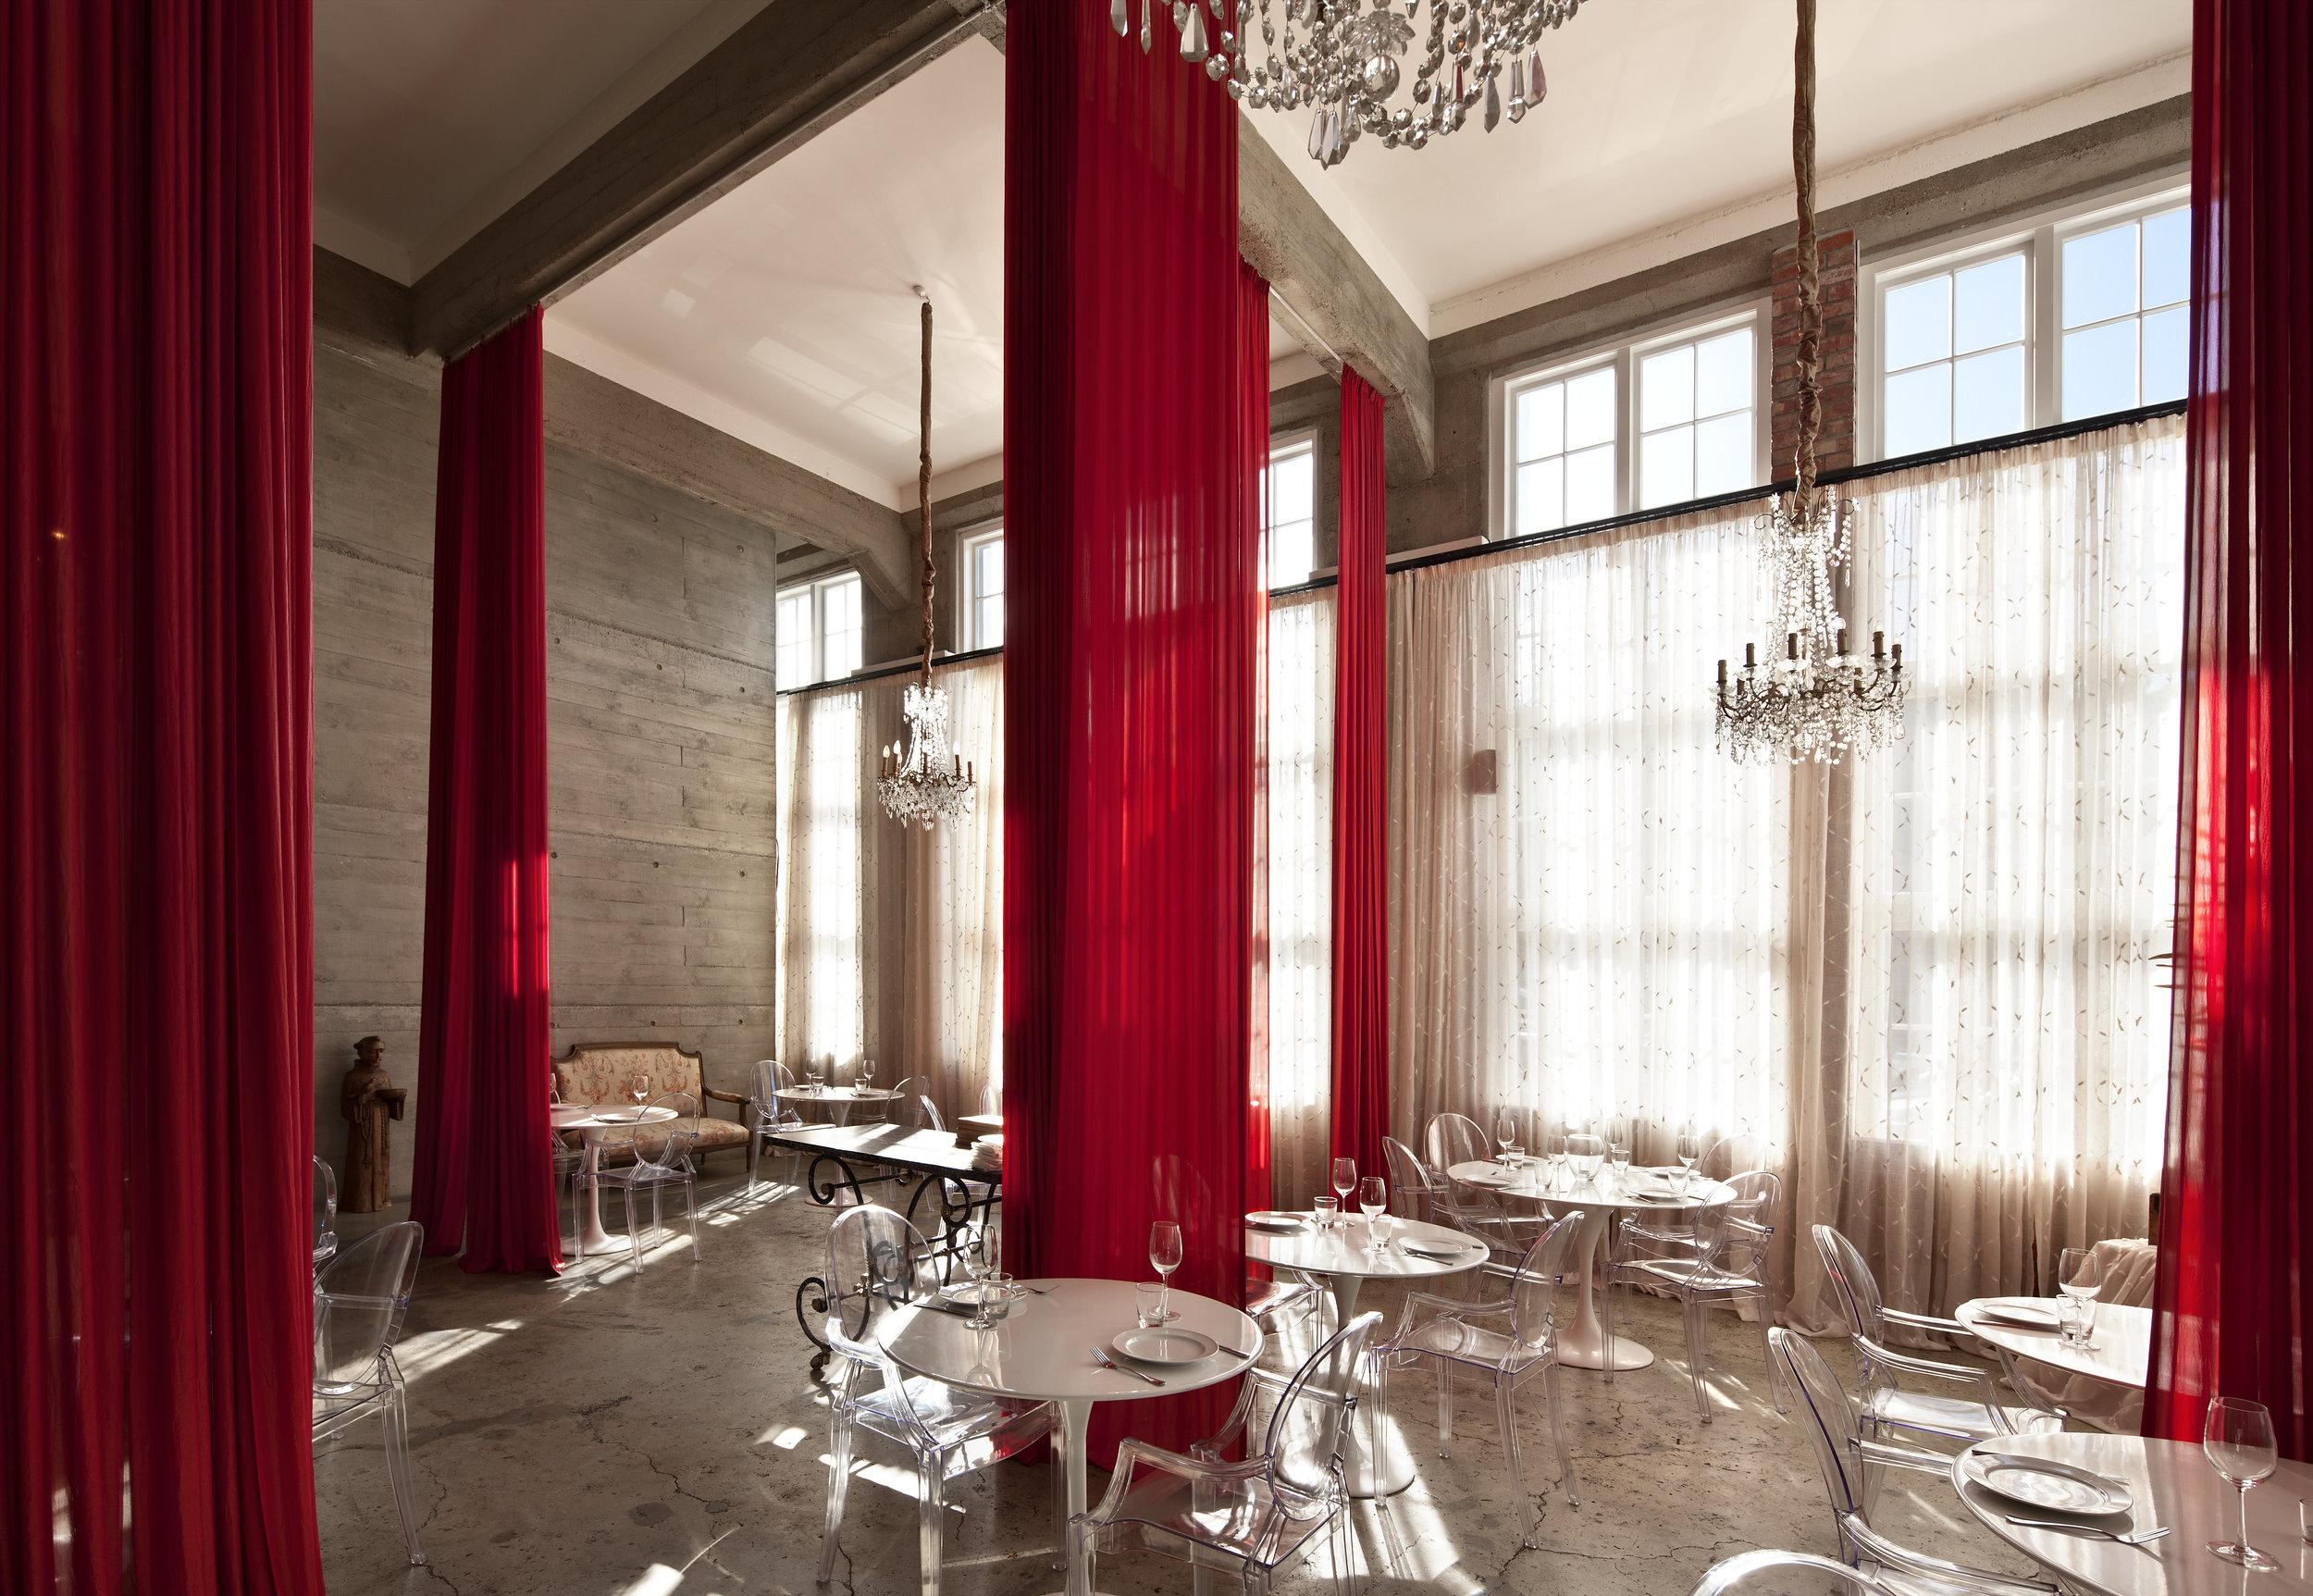 James Restaurant_Dining_2 of 6.jpg